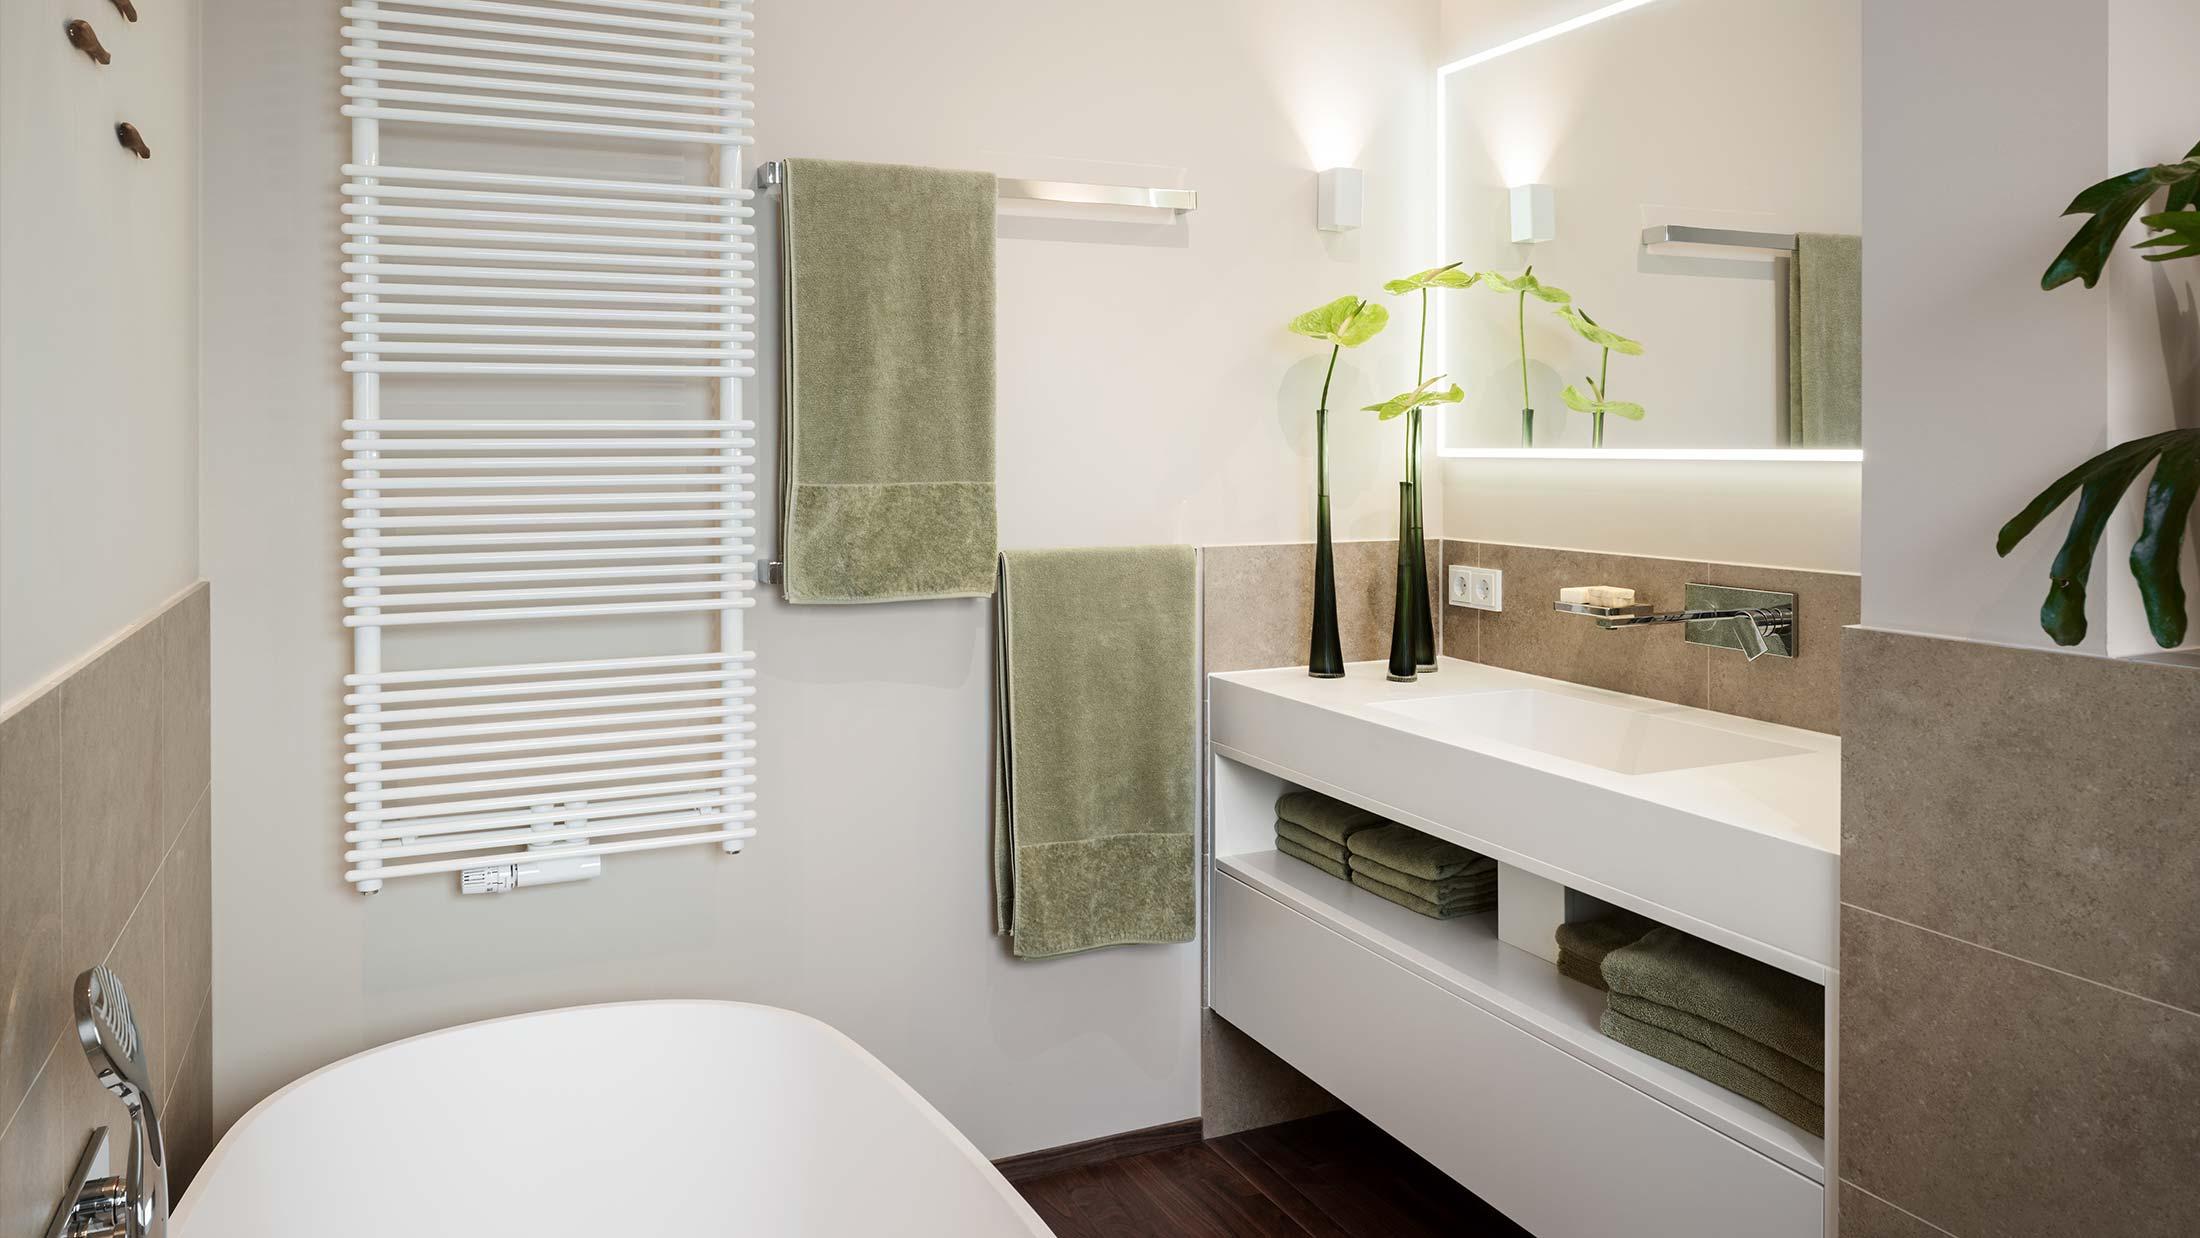 Penthouse Fünf Morgen: Baddesign, Luxusbad, Antonio Lupi Badobjekte